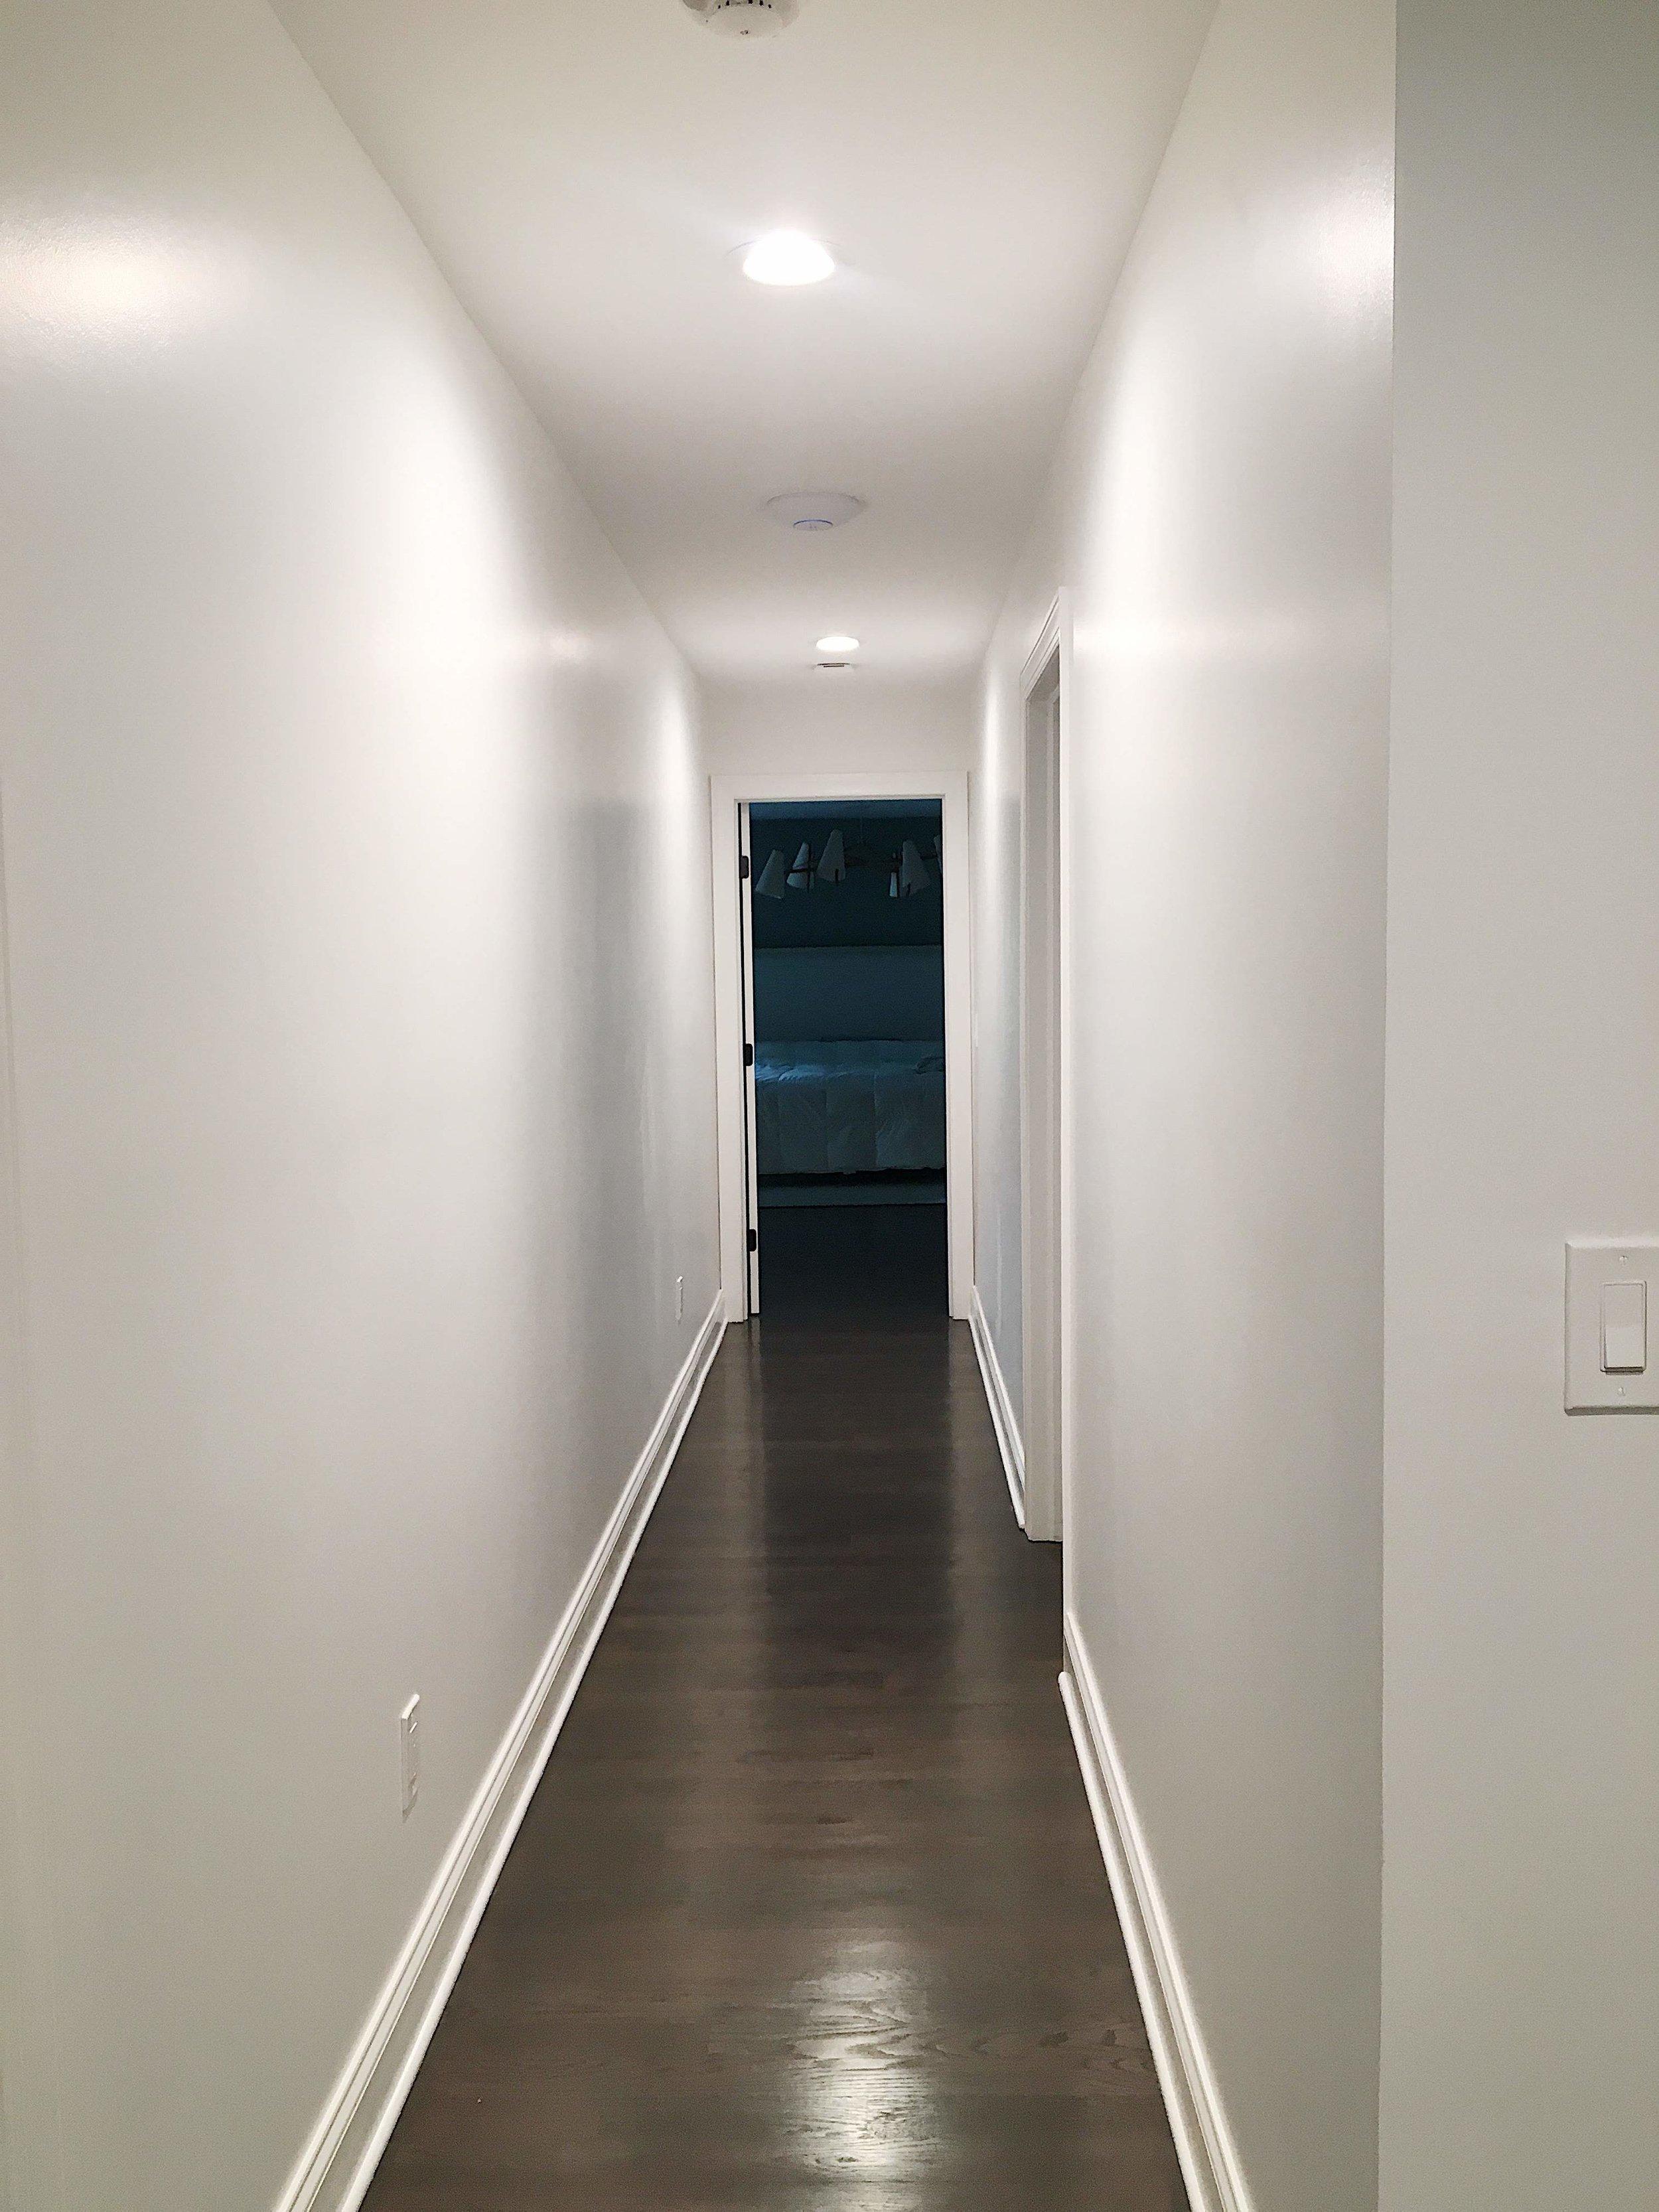 Behold said XXL hallway